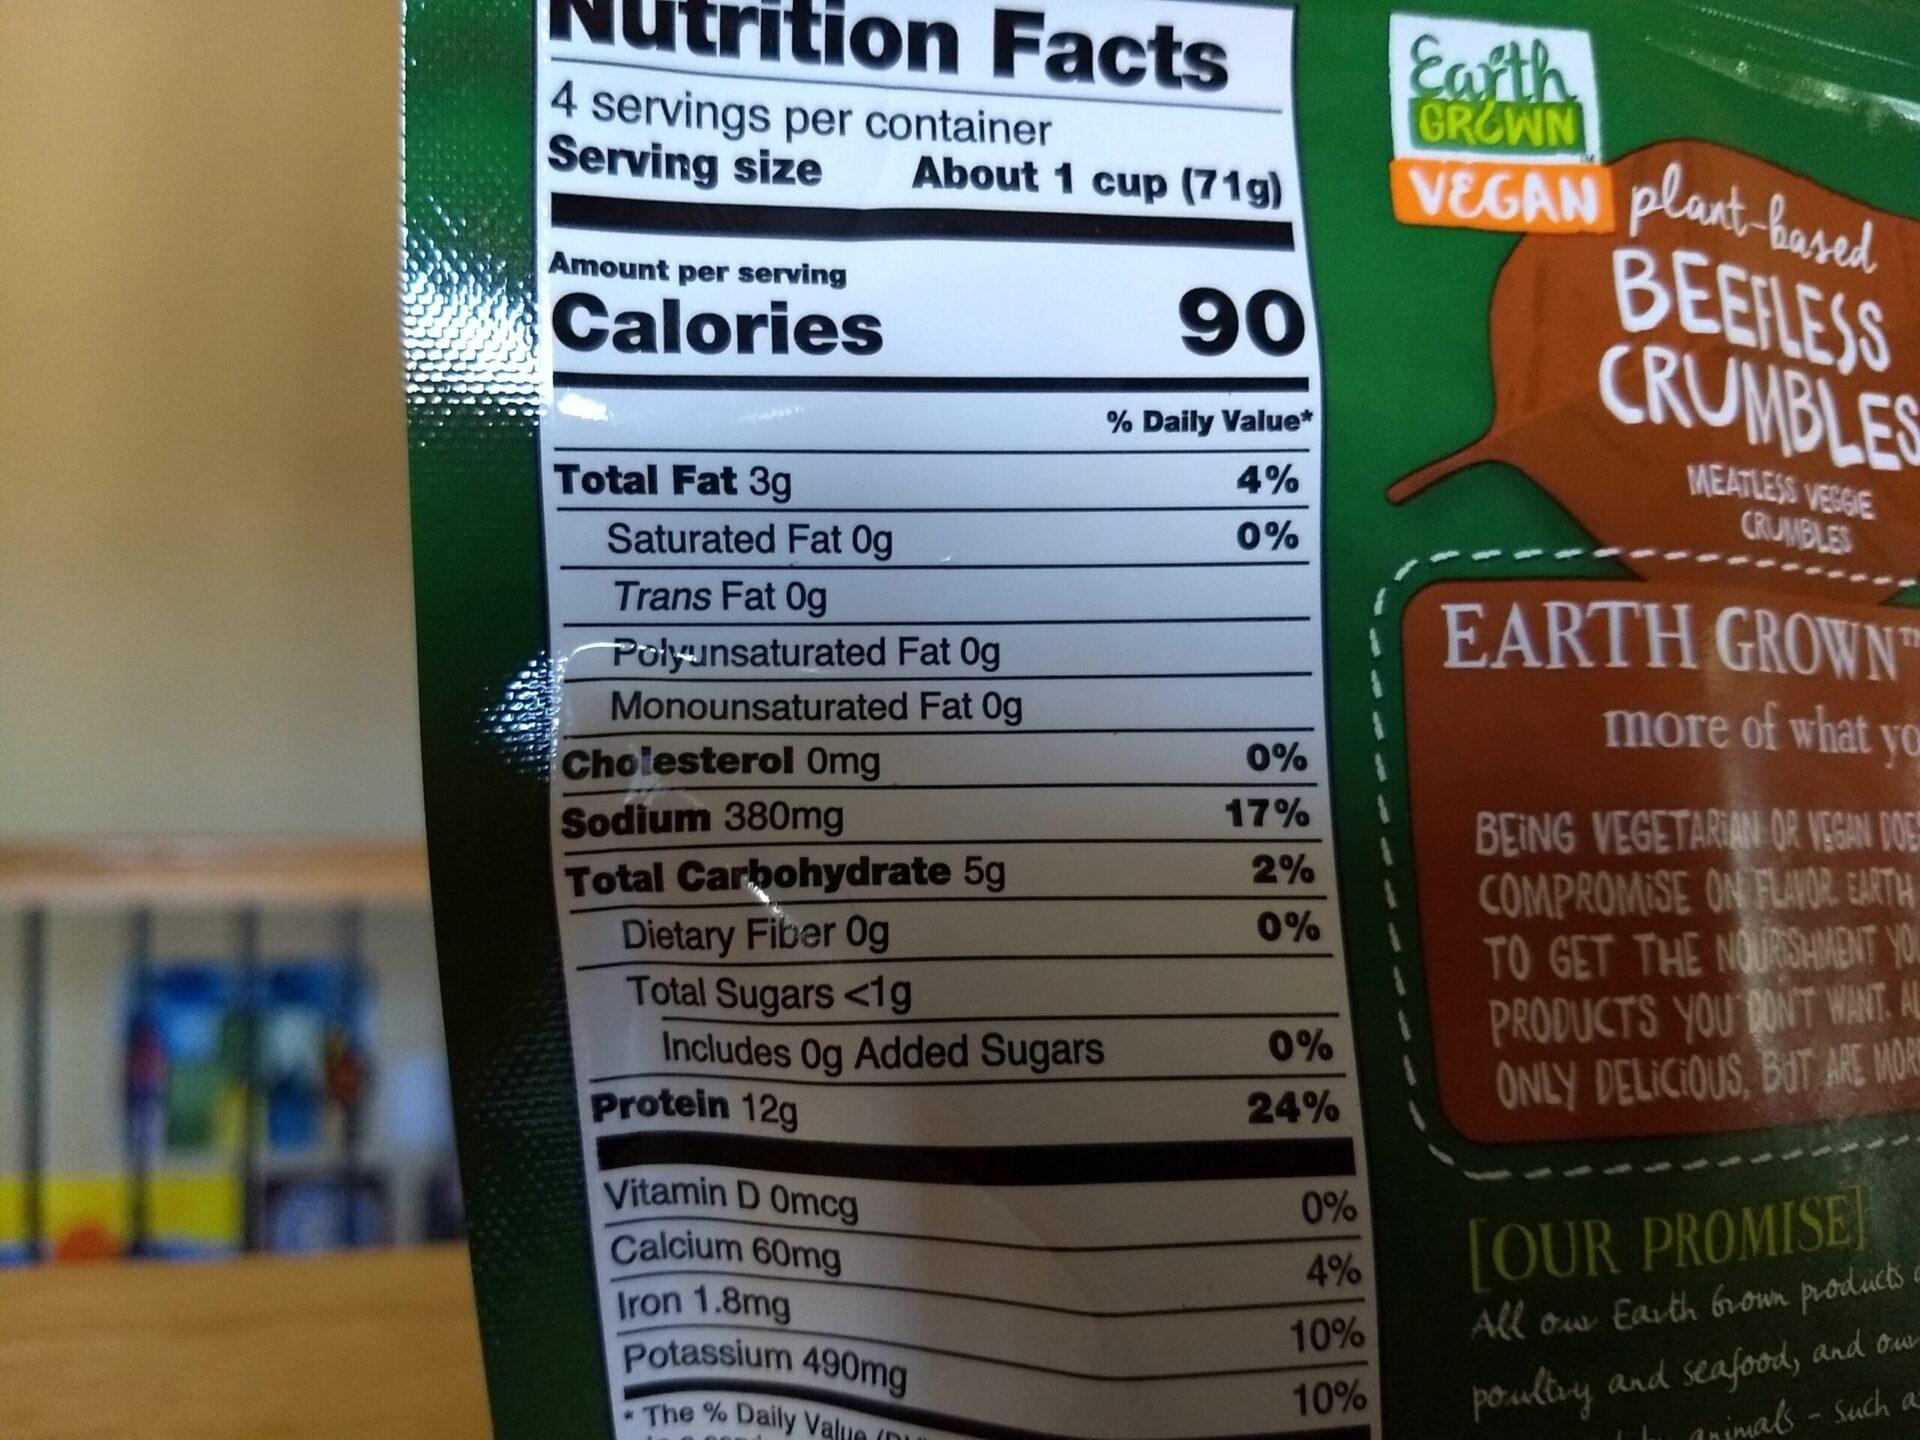 Earth Grown Vegan Beefless Crumbles | ALDI REVIEWER